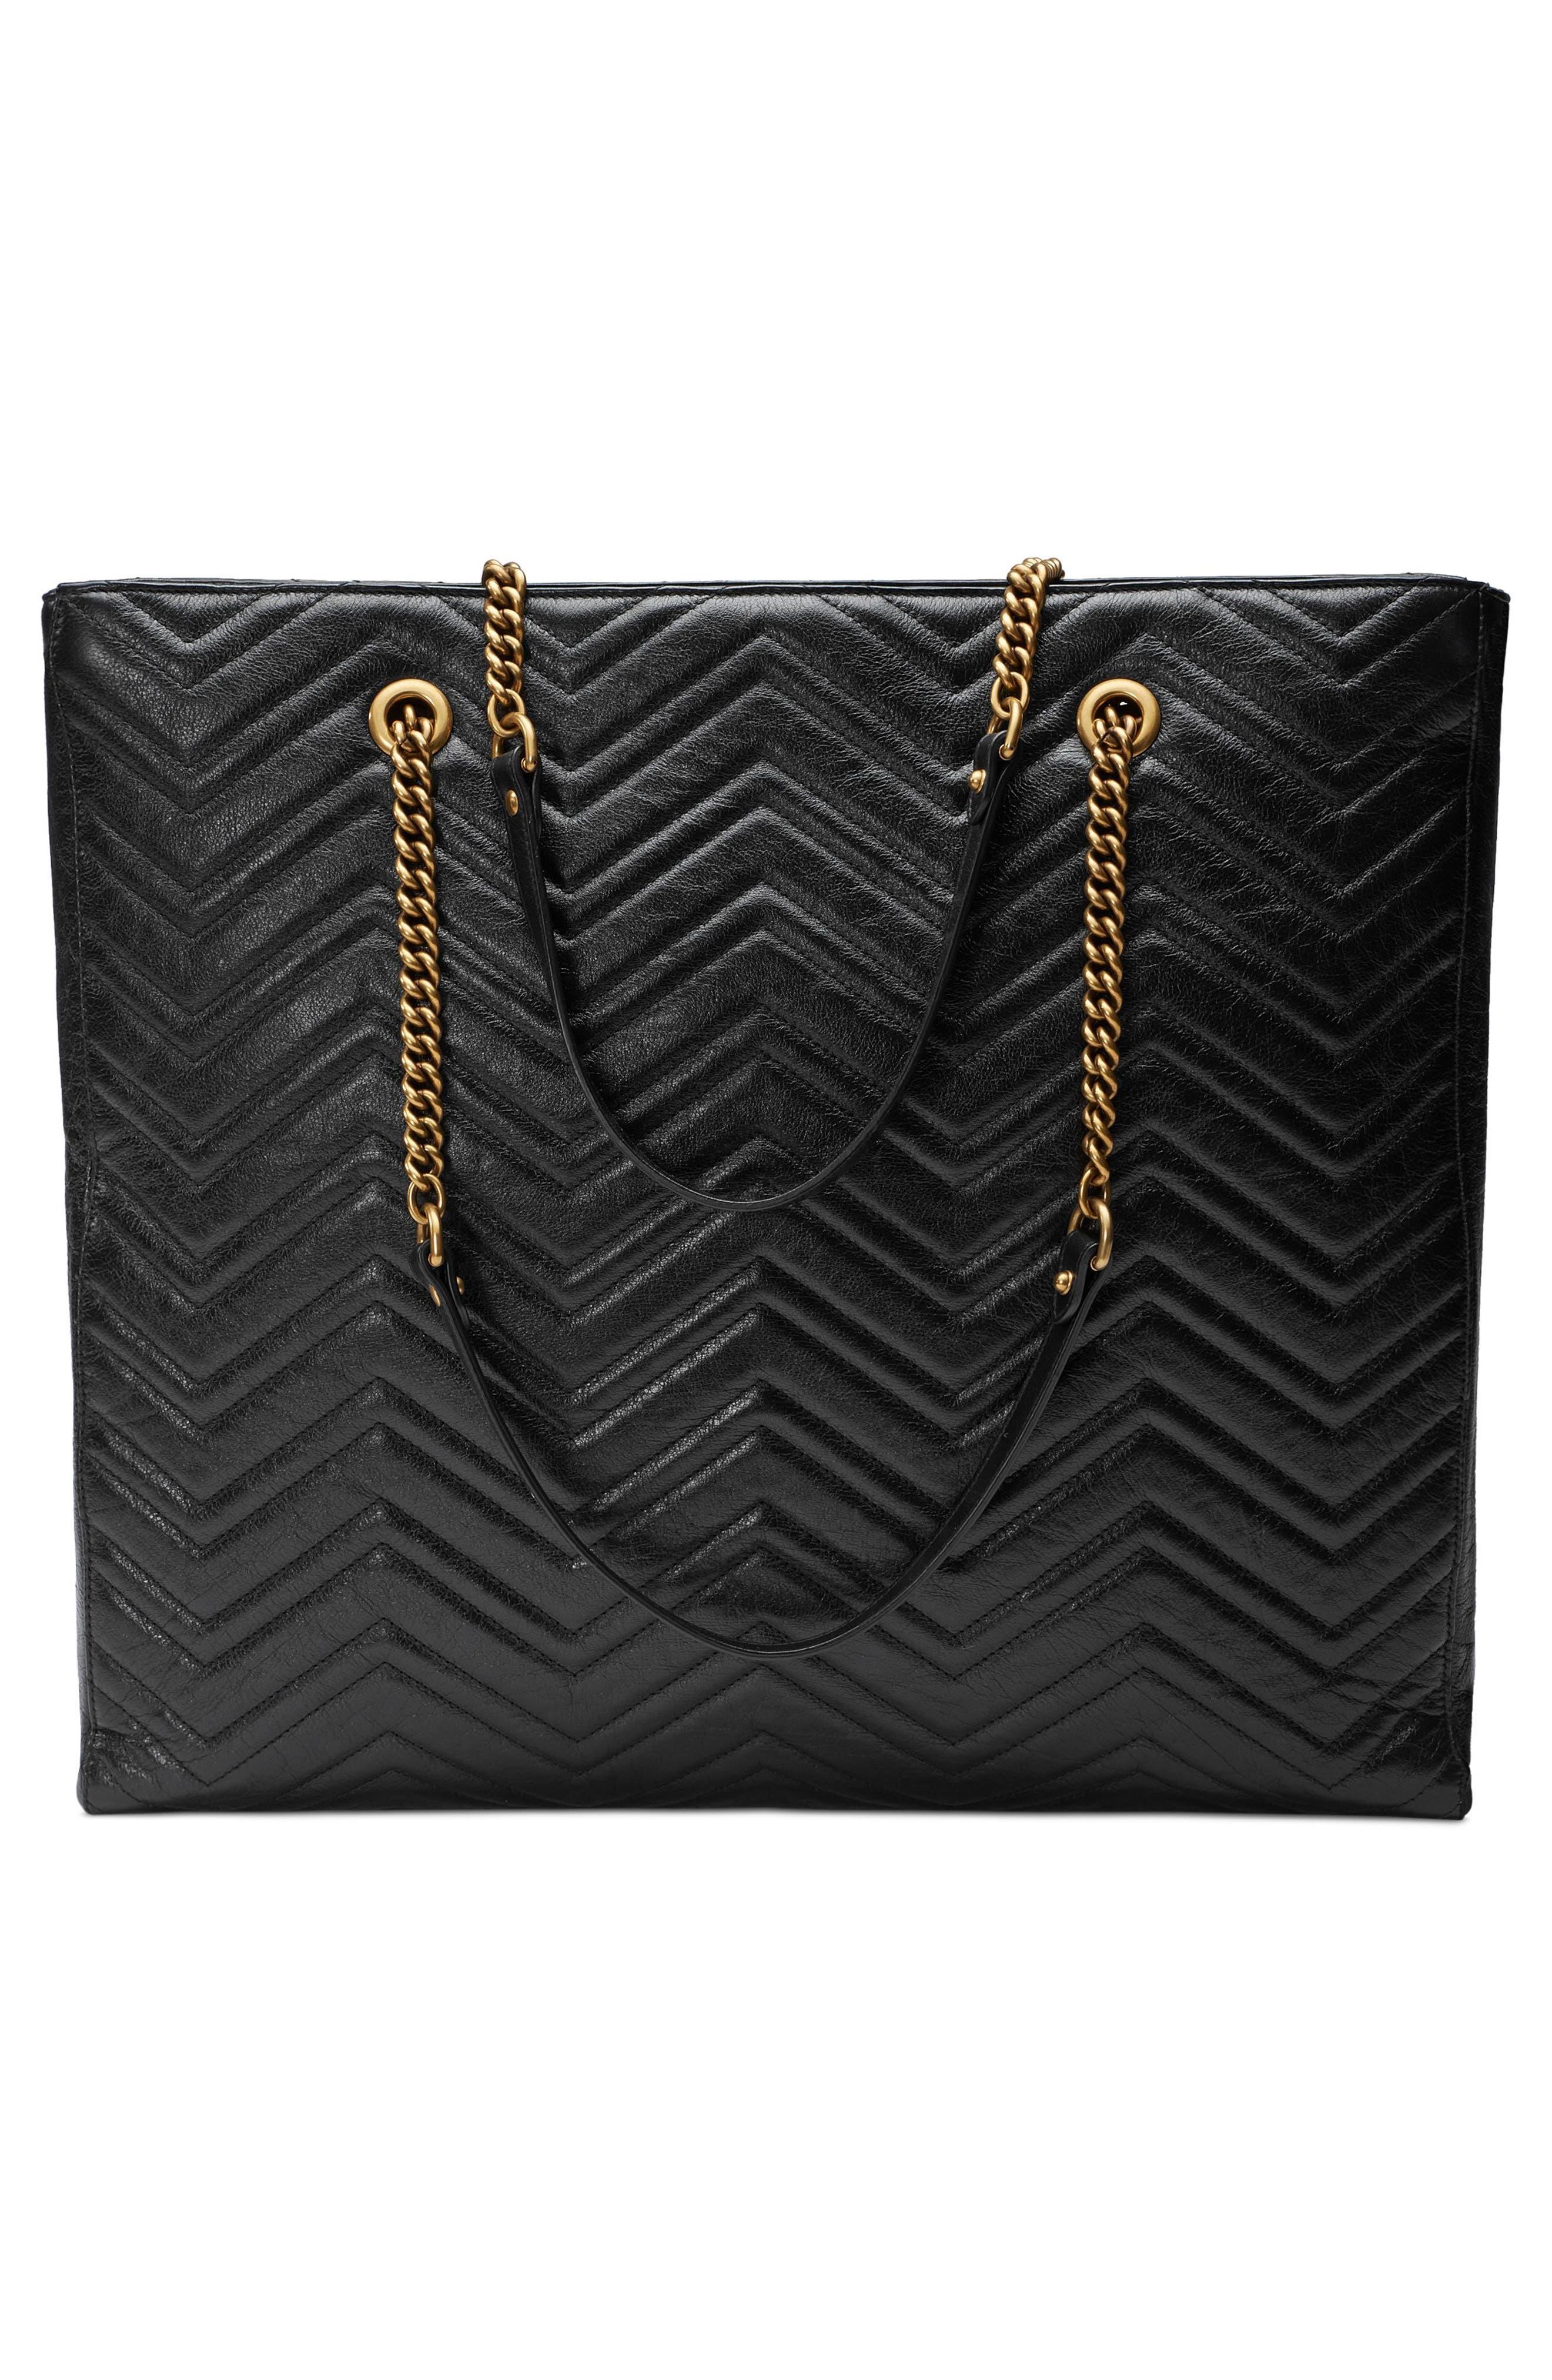 GG Marmont 2.0 Matelassé Leather North/South Tote Bag,                             Alternate thumbnail 2, color,                             NERO/ NERO